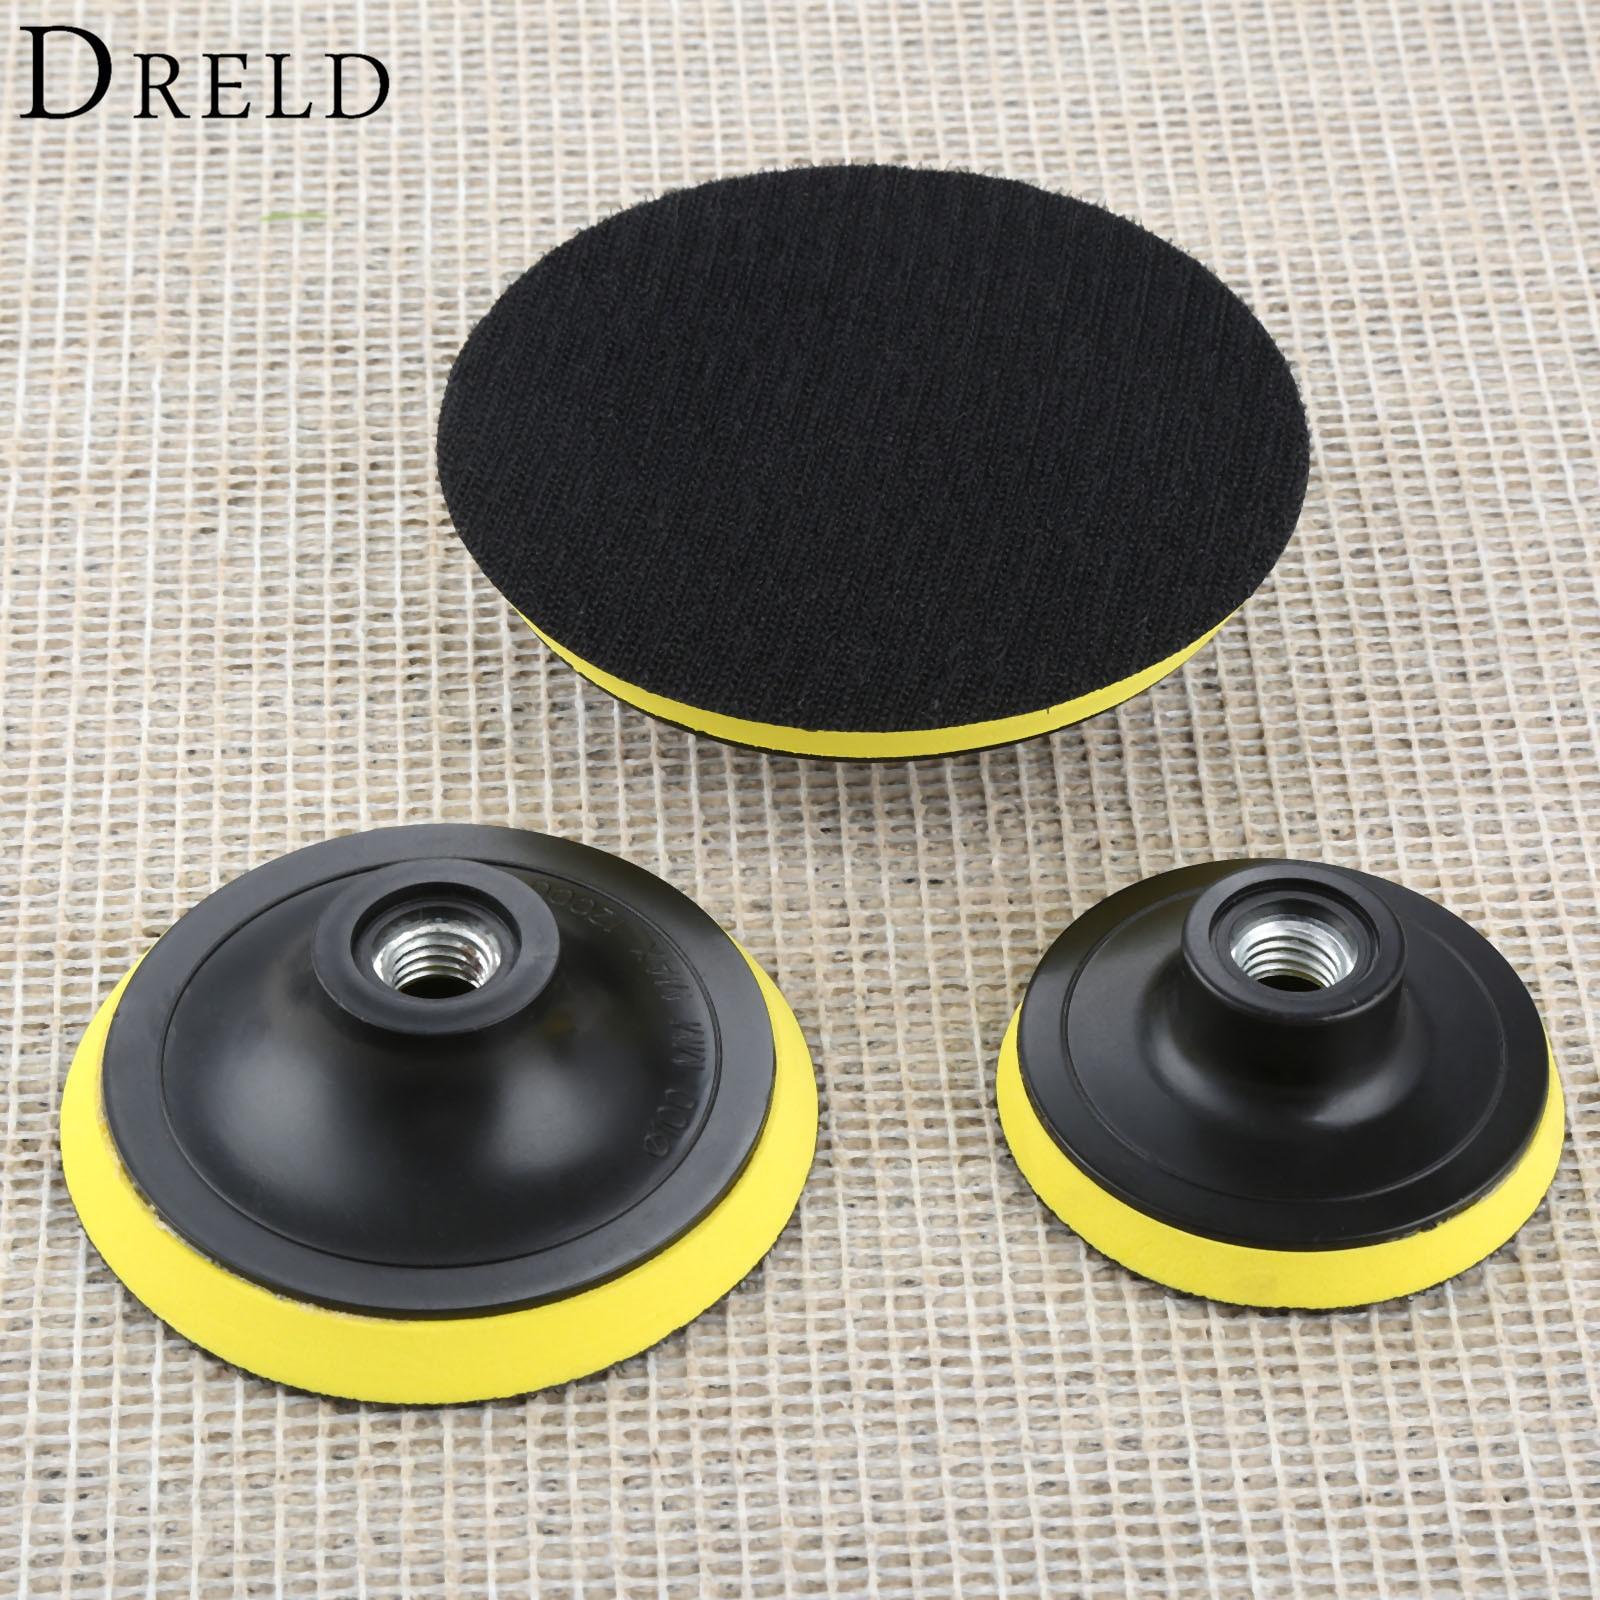 DRELD 1pc 3/4/5 Inch Car M14 Backing Plate Pad Hook Loop Polishing Buffing Pad Dia.75mm 100mm 125mm